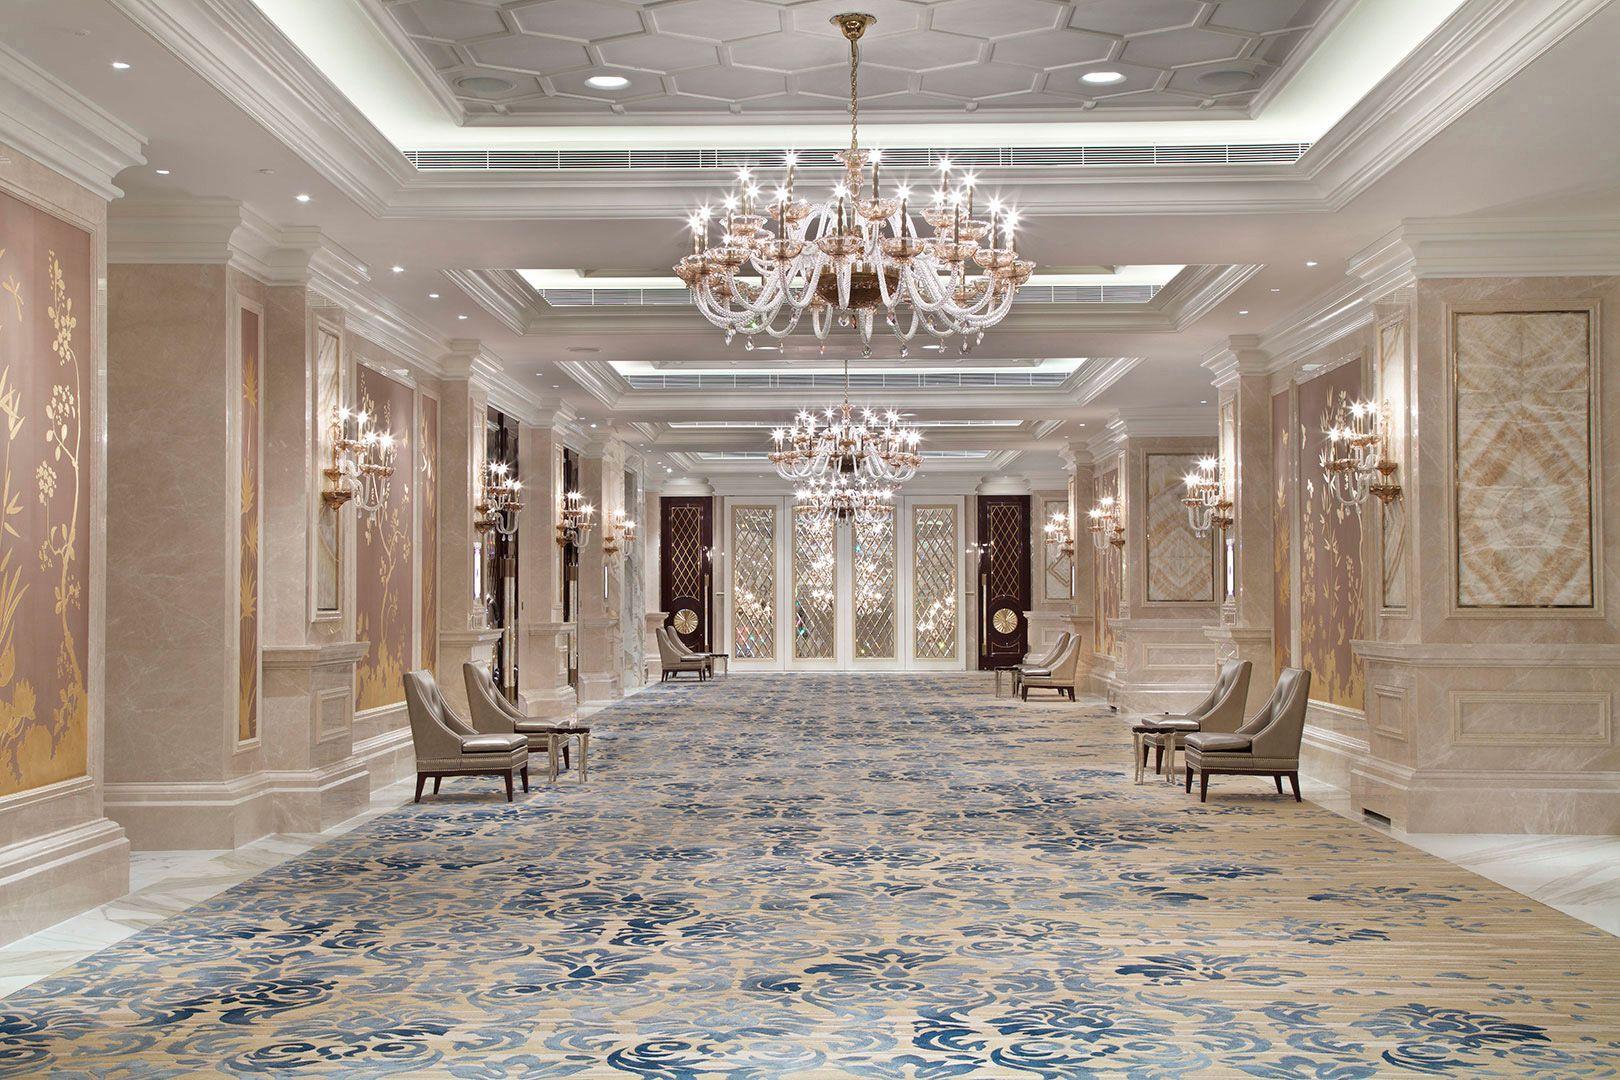 Hba Ritz Carlton Galaxy Macau In 2019 Hall